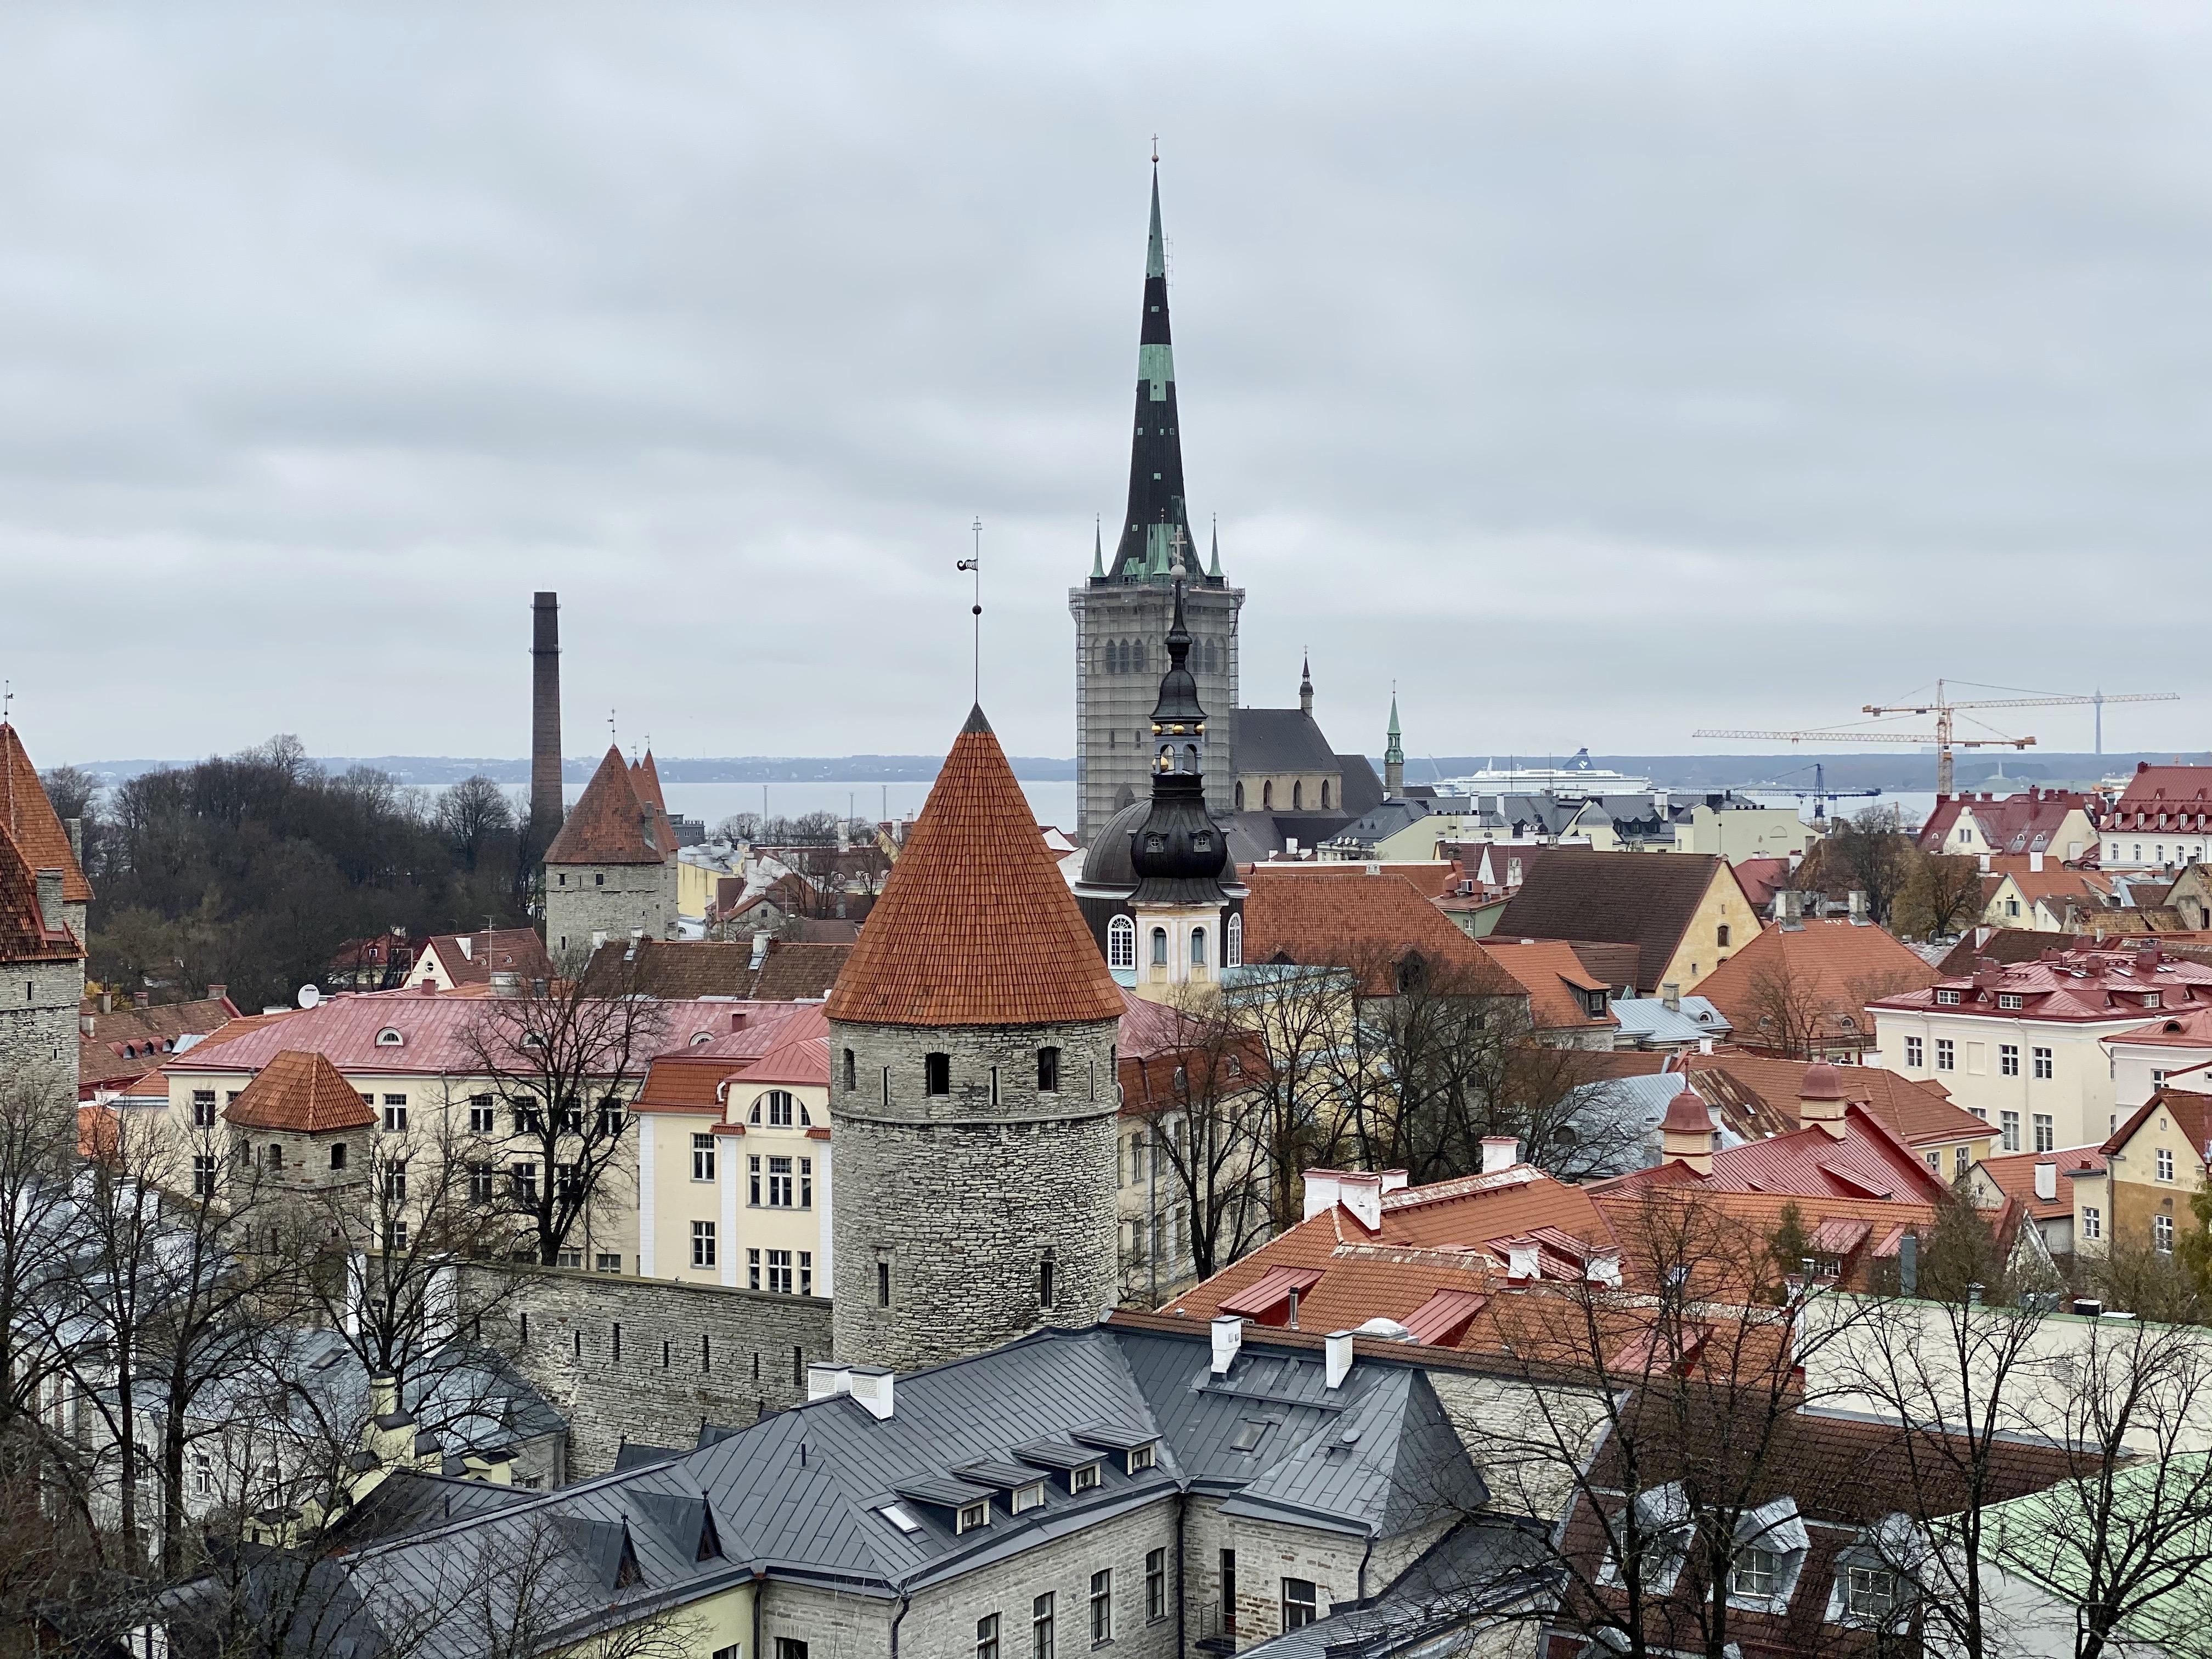 Views over Tallinn, Estonia.